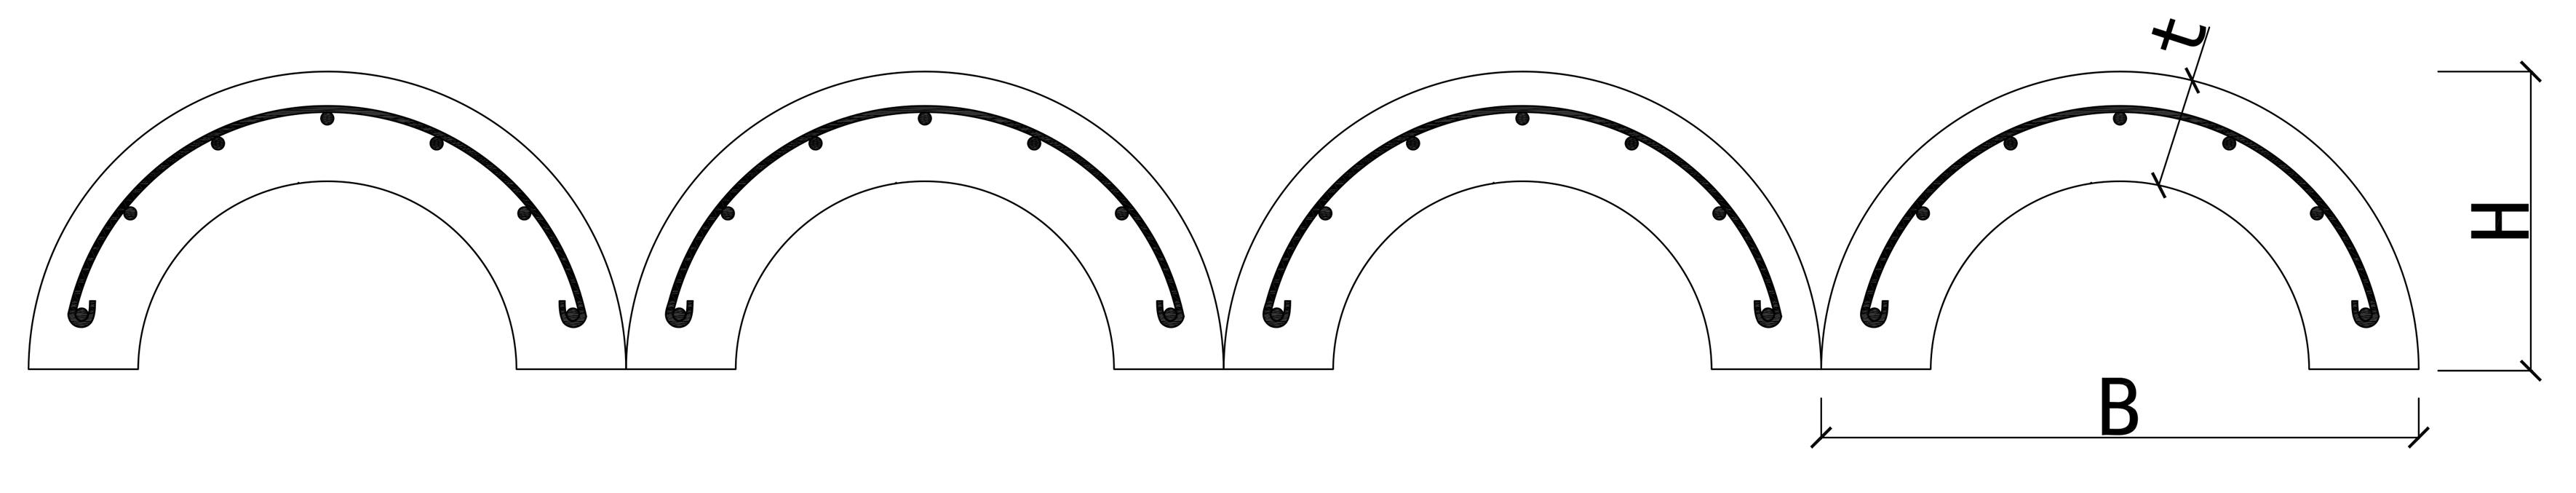 M形截面拼裝方式.jpg